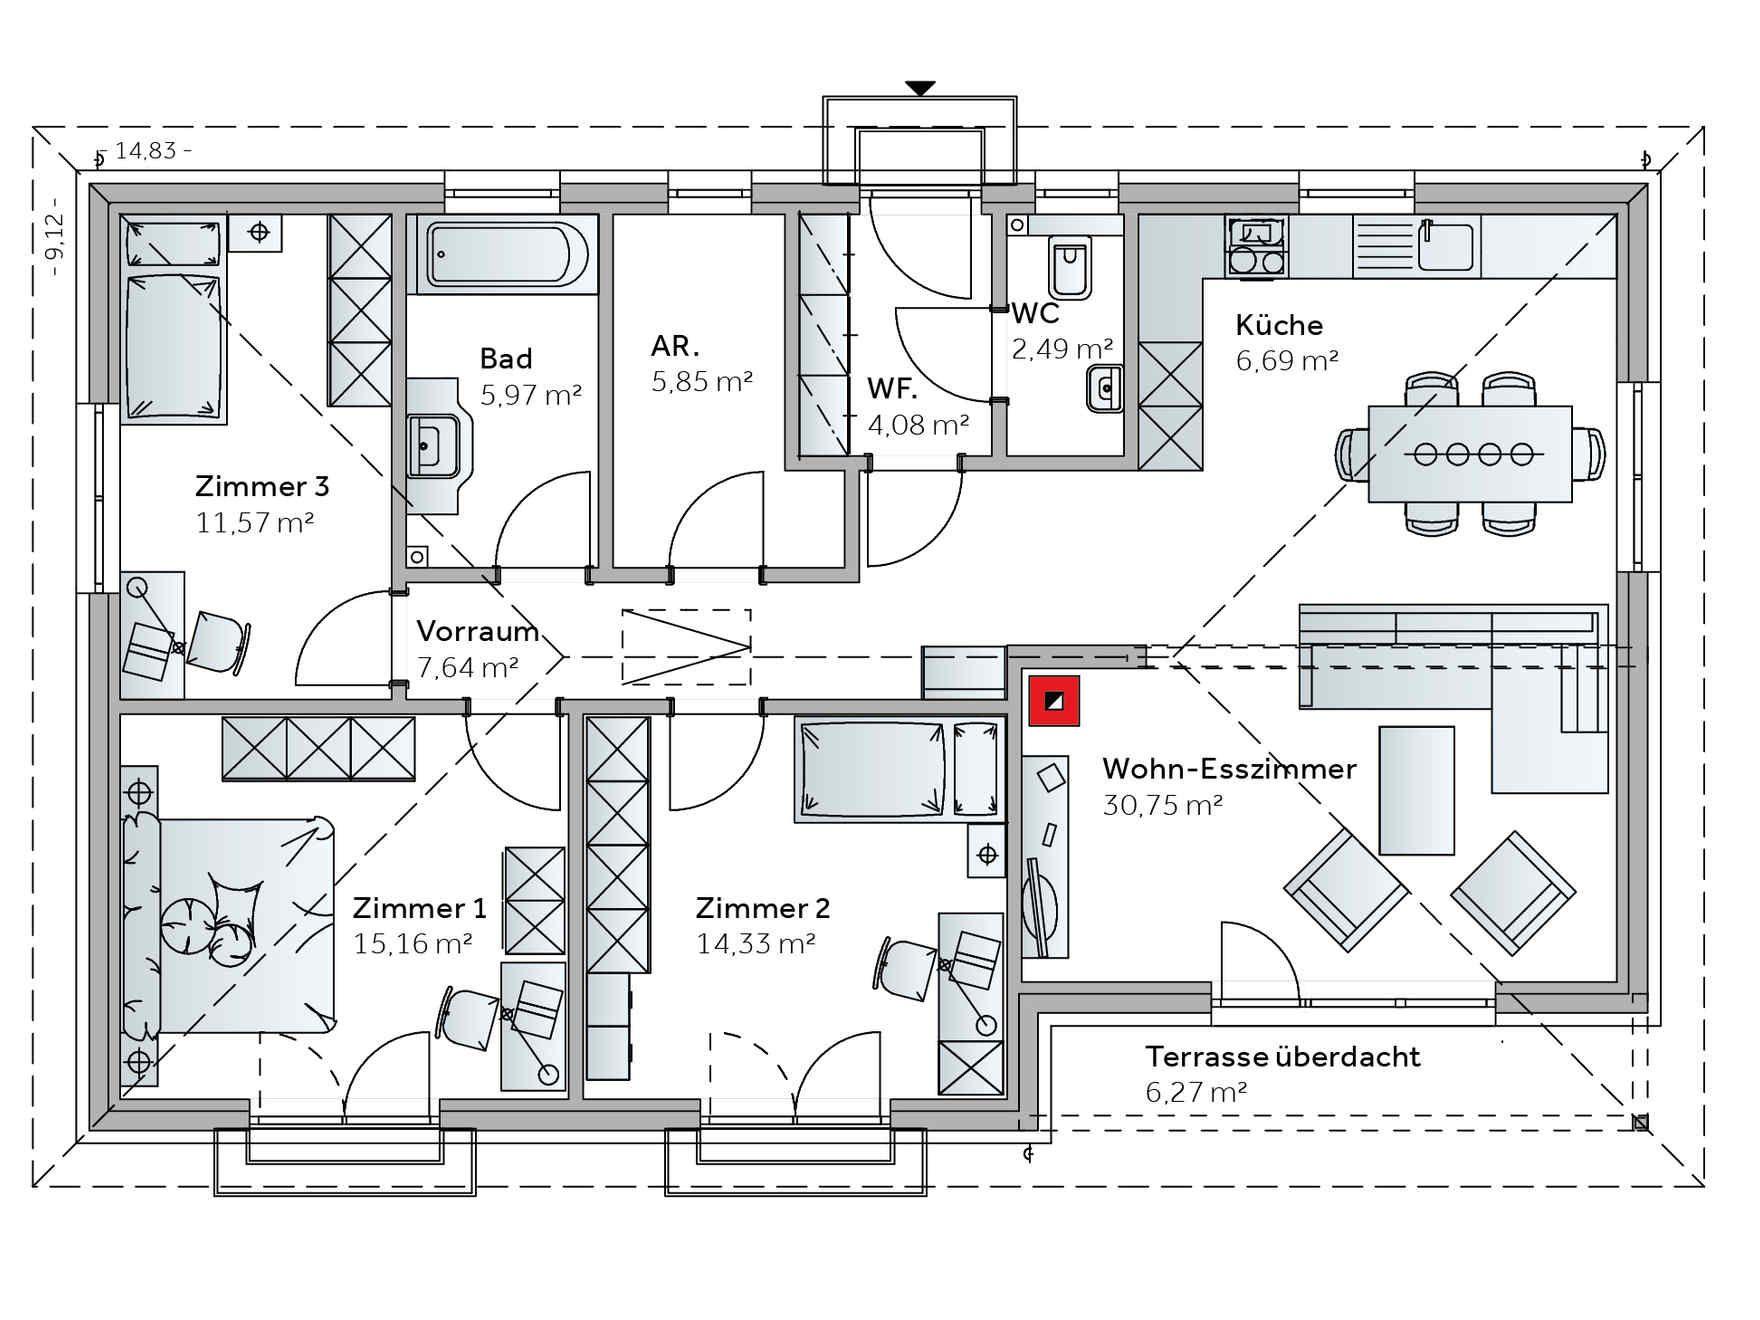 fertighaus bungalow family vii haus pinterest haus bungalow und grundriss bungalow. Black Bedroom Furniture Sets. Home Design Ideas